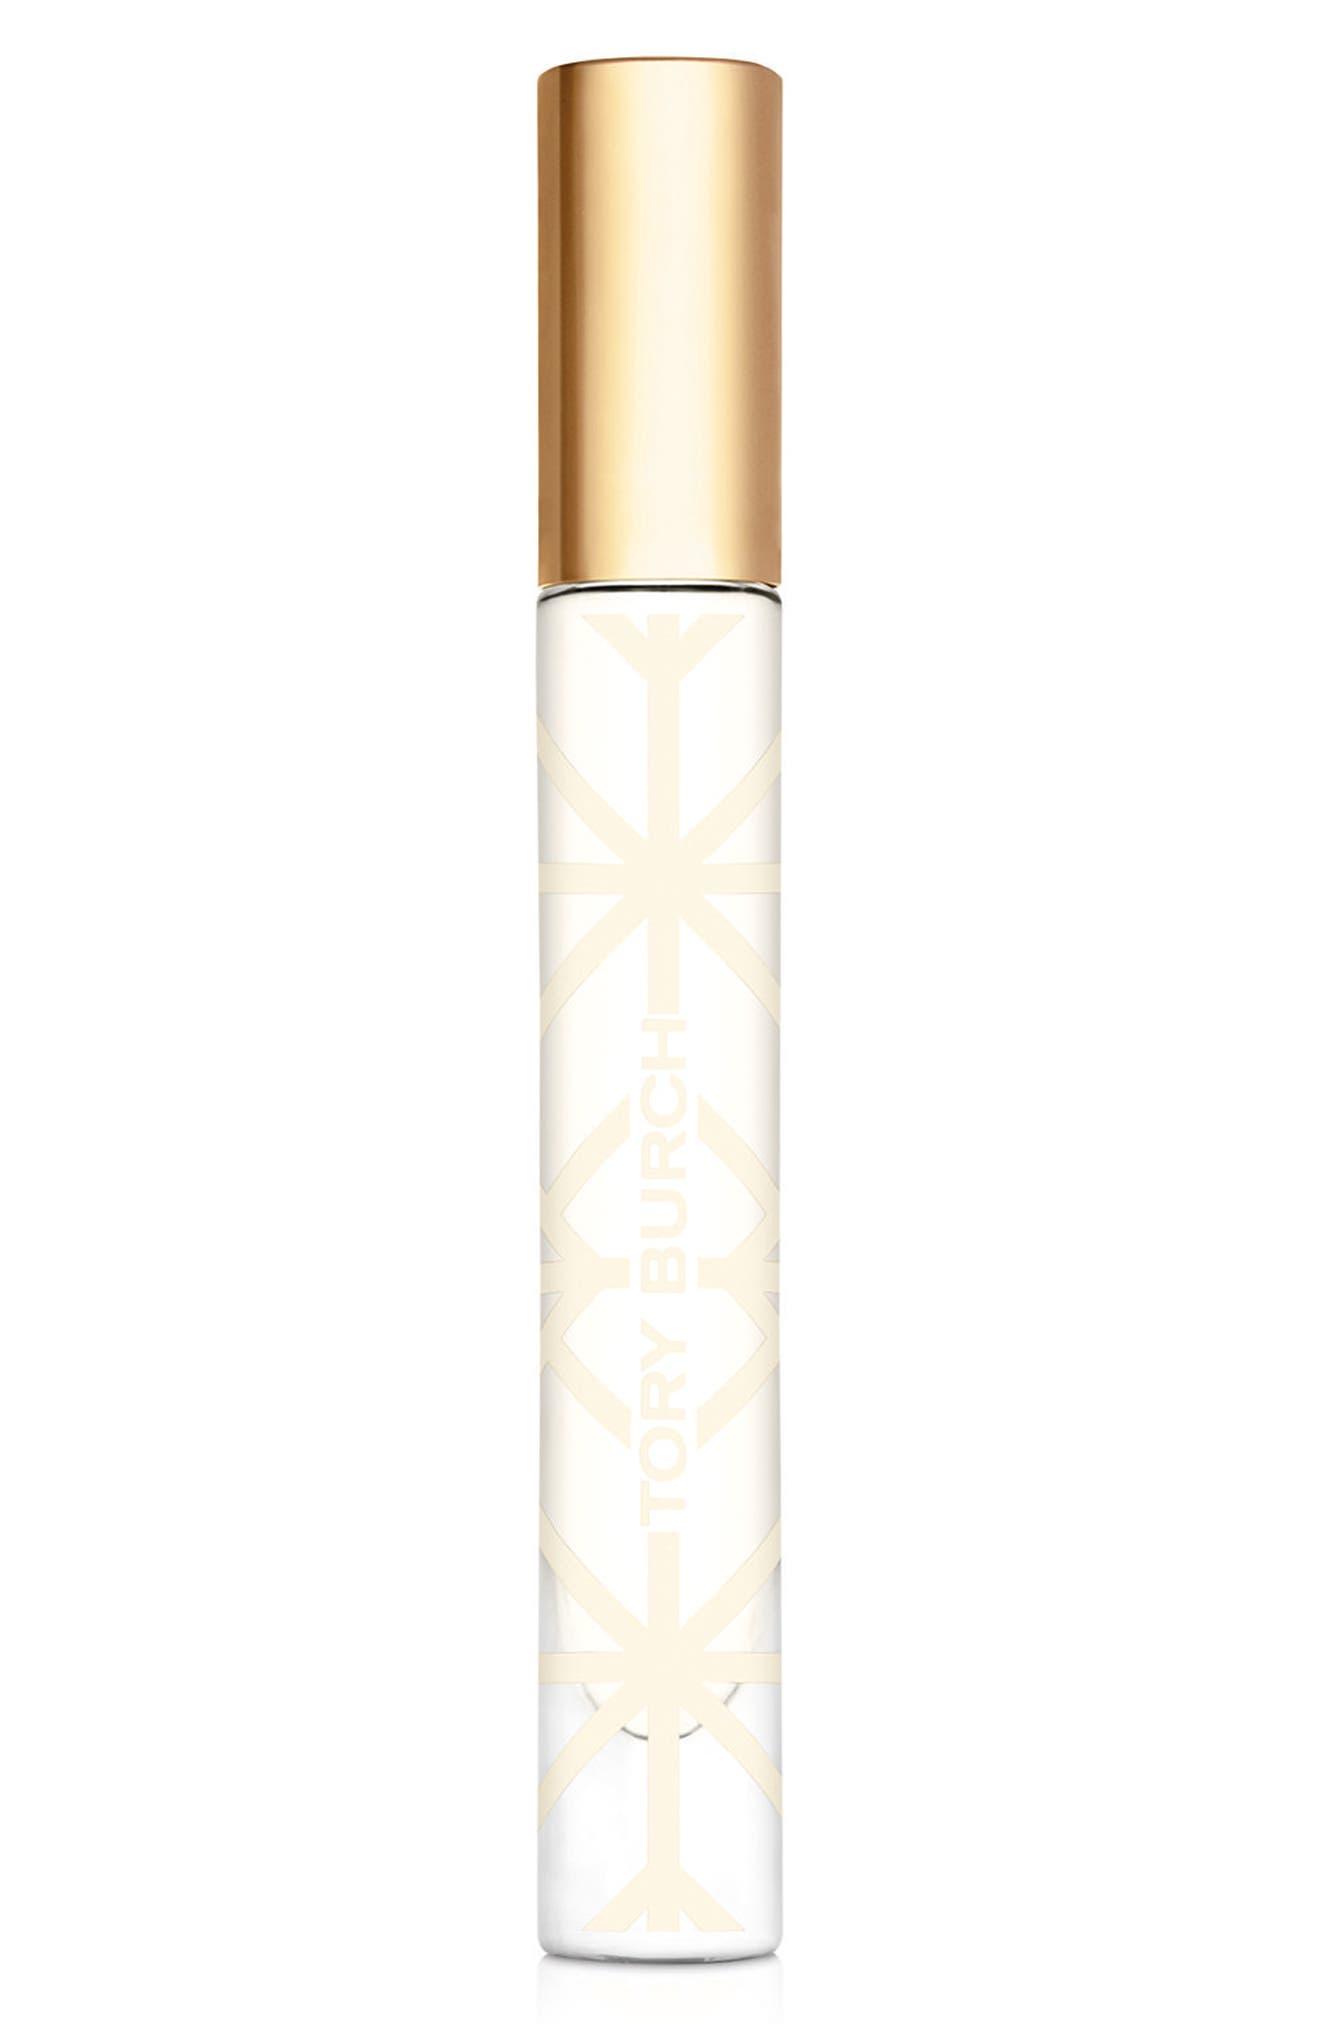 Tory Burch Just Like Heaven Extrait de Parfum Rollerball